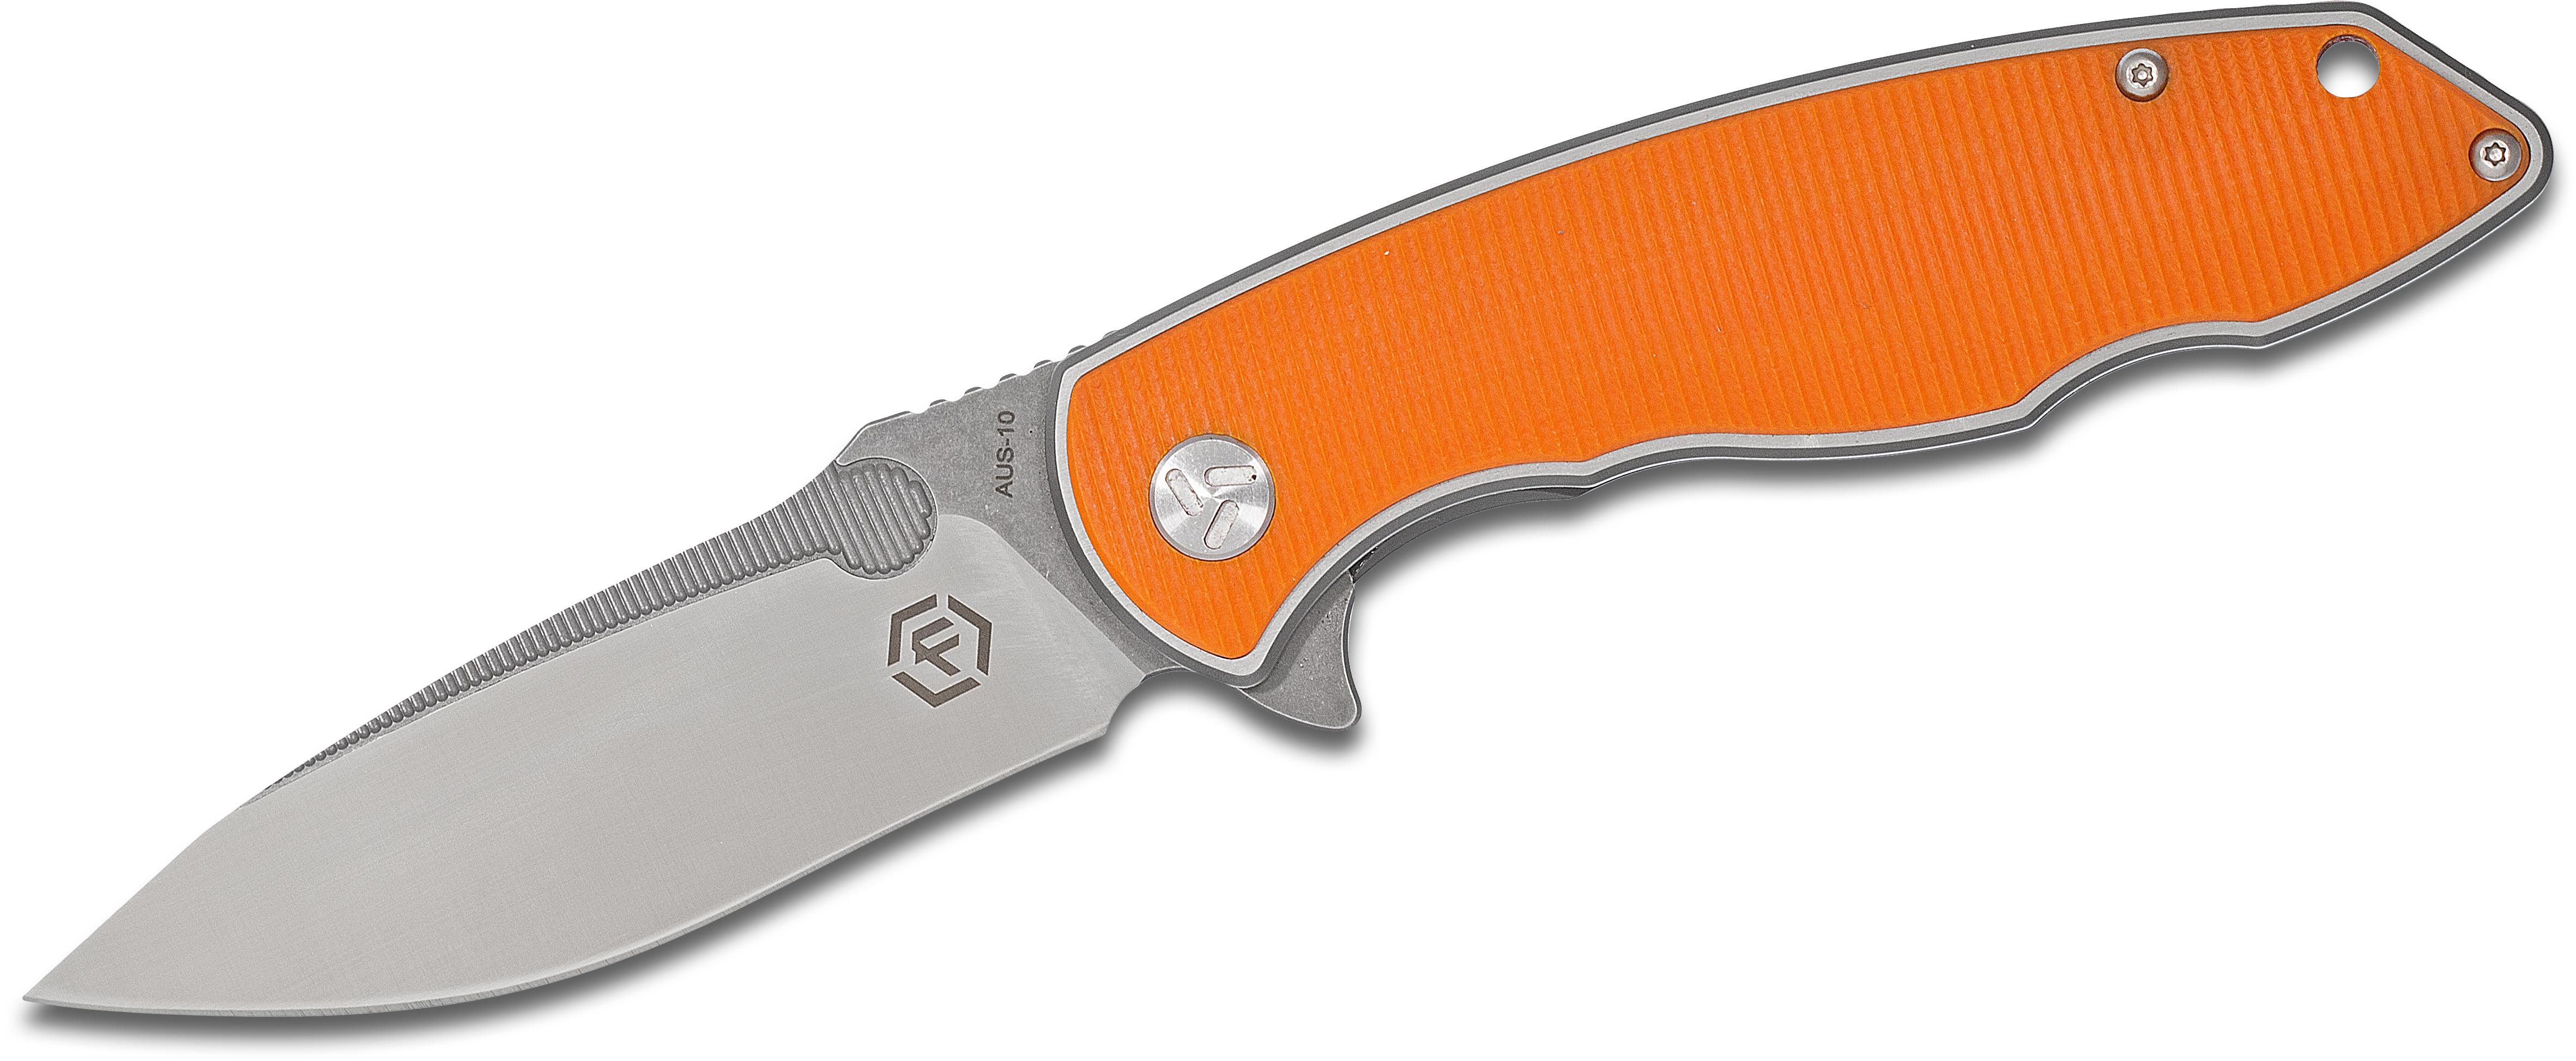 Factor Equipment FH003 Hardened Flipper 3.7 inch AUS-10 Two-Tone Blade, Orange G10 Handles